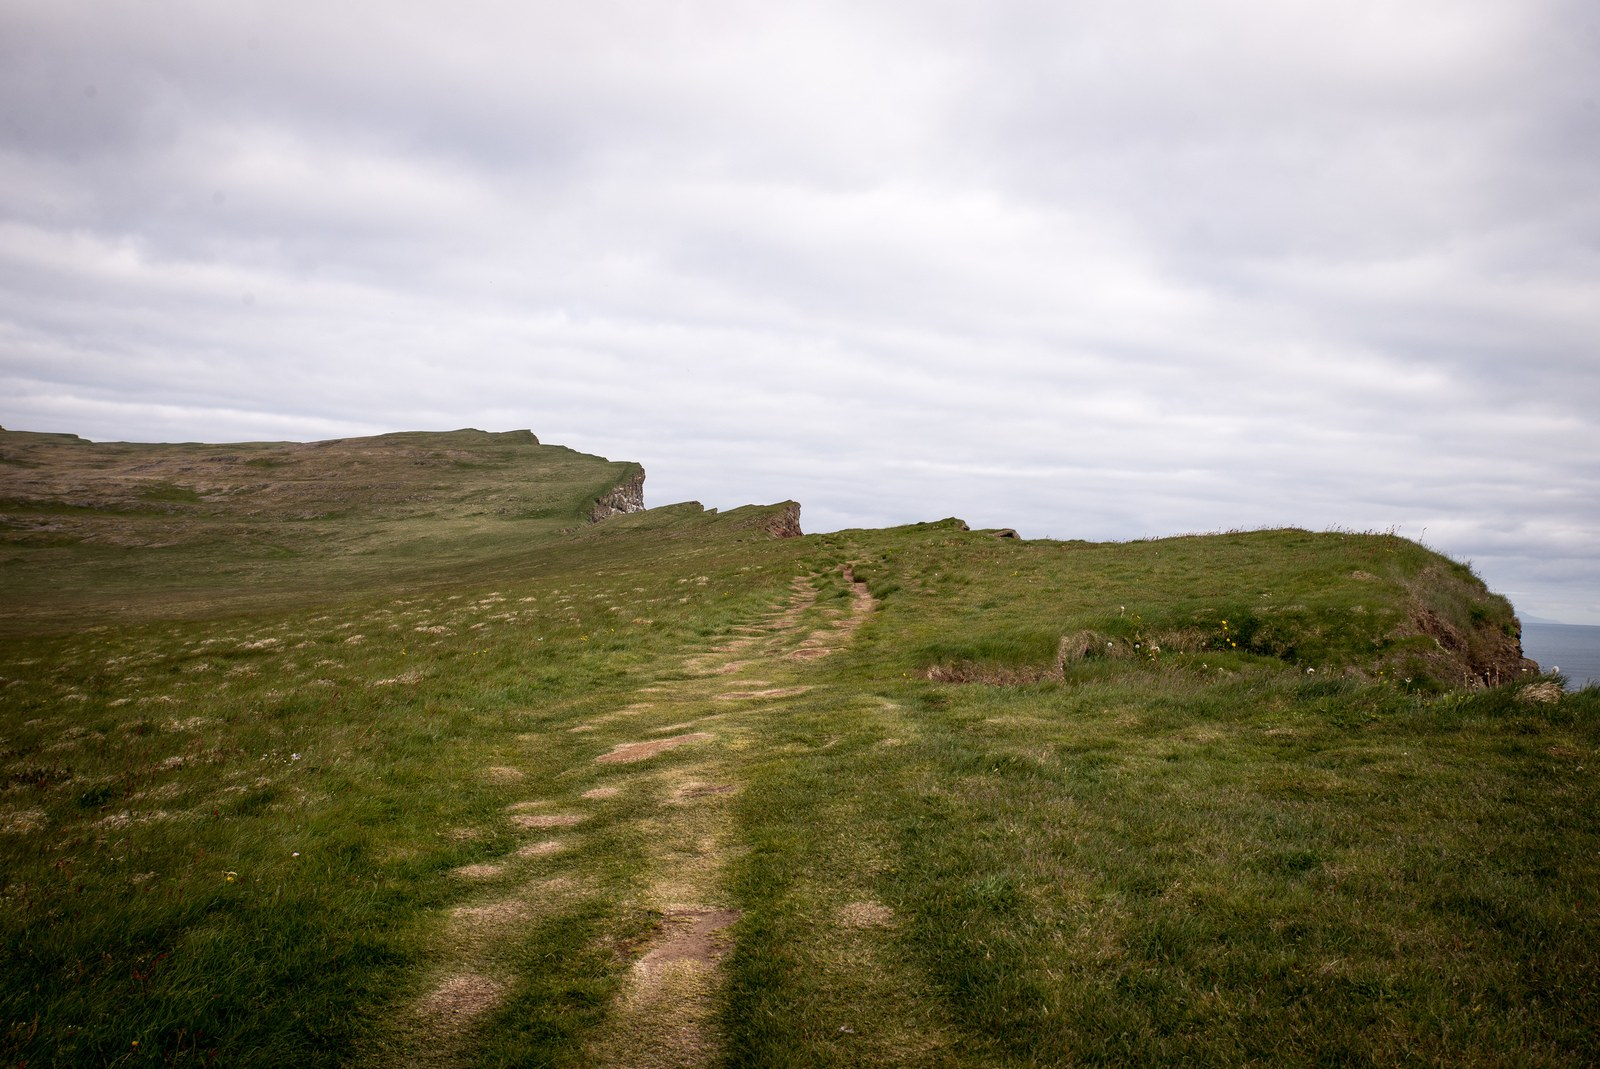 Chemin longeant le bord des falaises  Látrabjarg